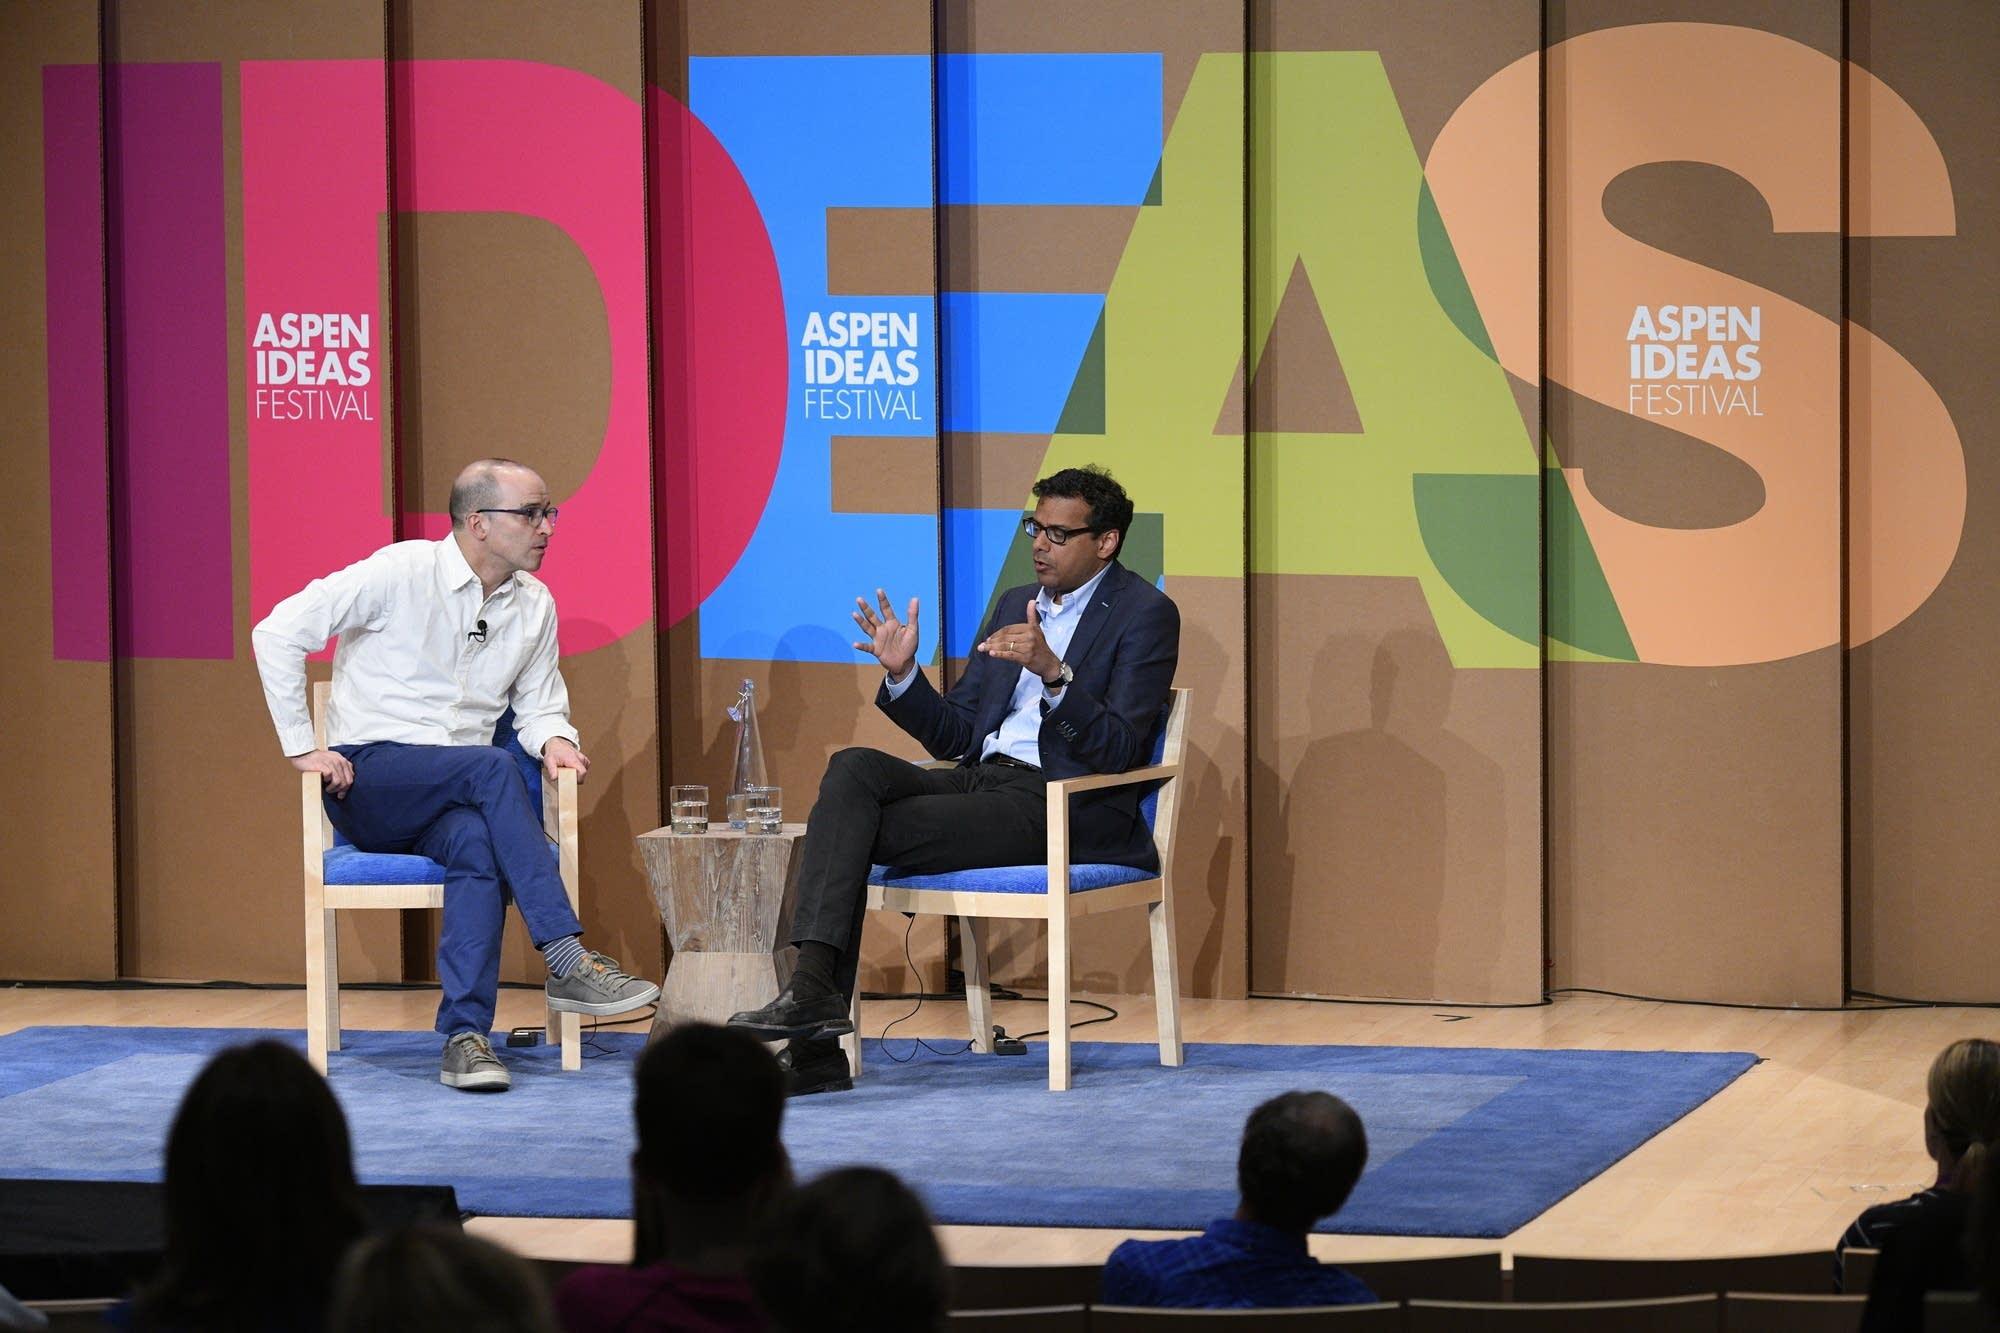 David Leonhardt and Atul Gawande discuss health care